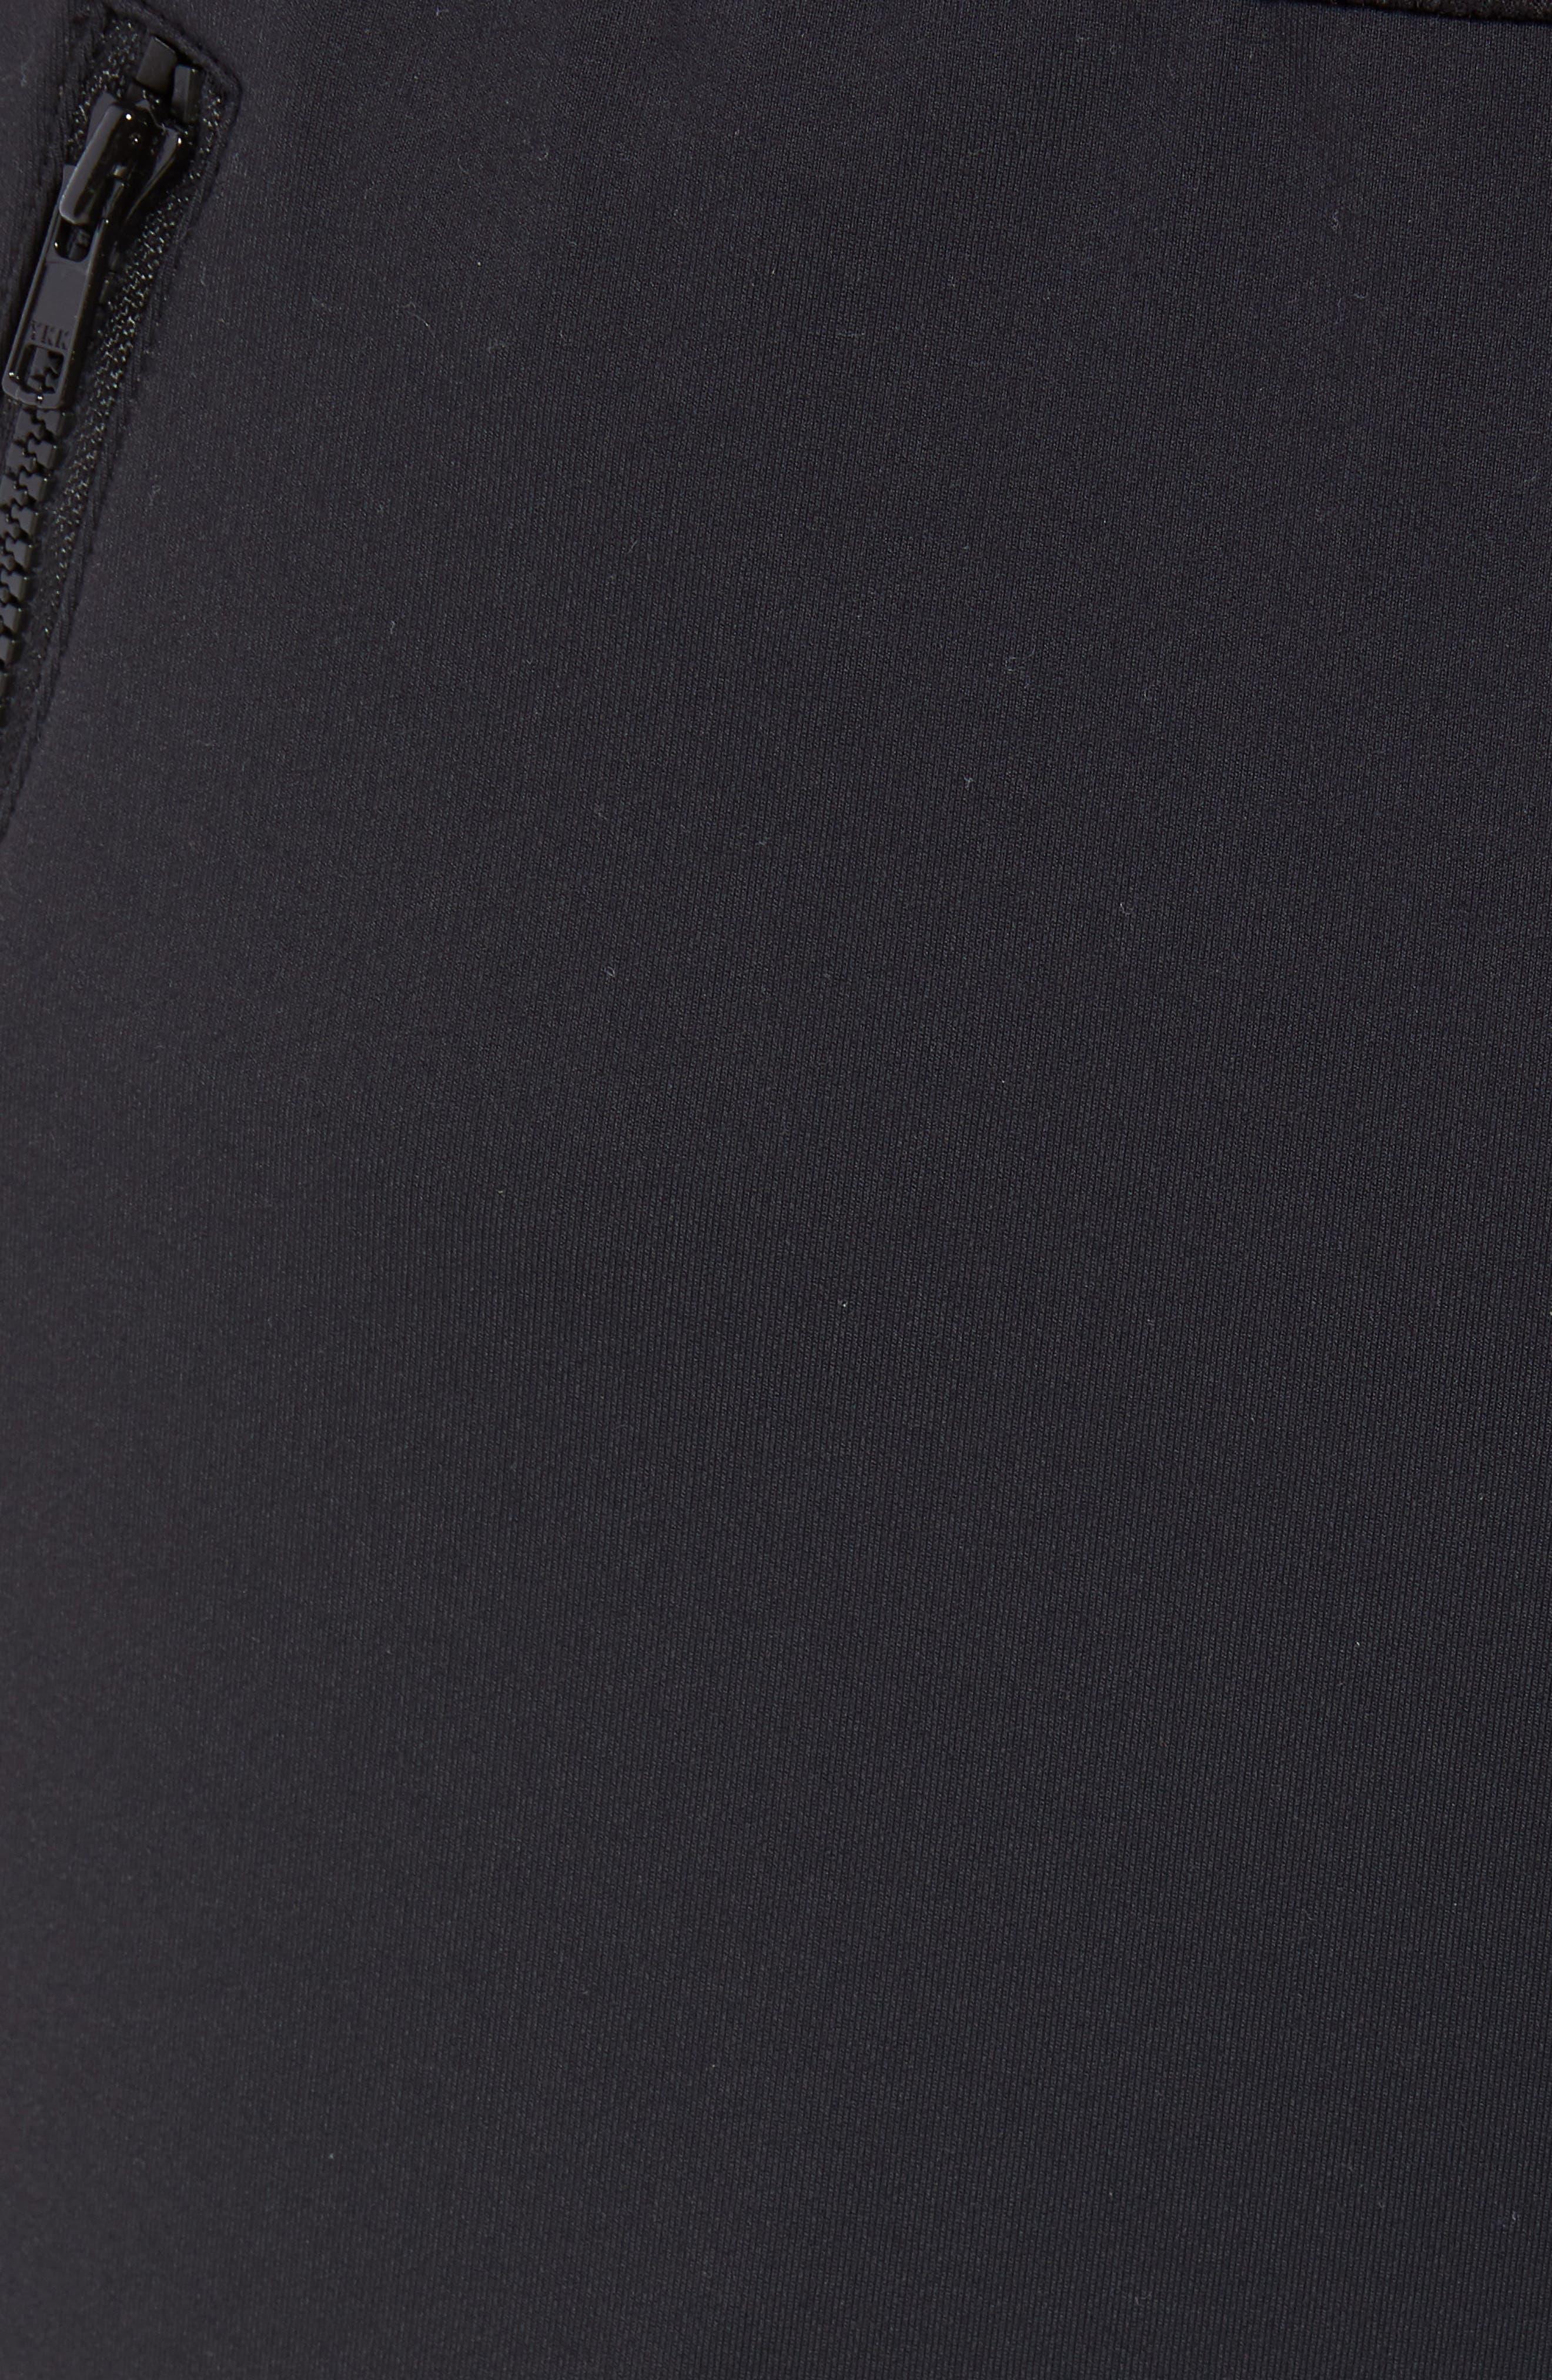 Technical Moto Joggers,                             Alternate thumbnail 5, color,                             BLACK